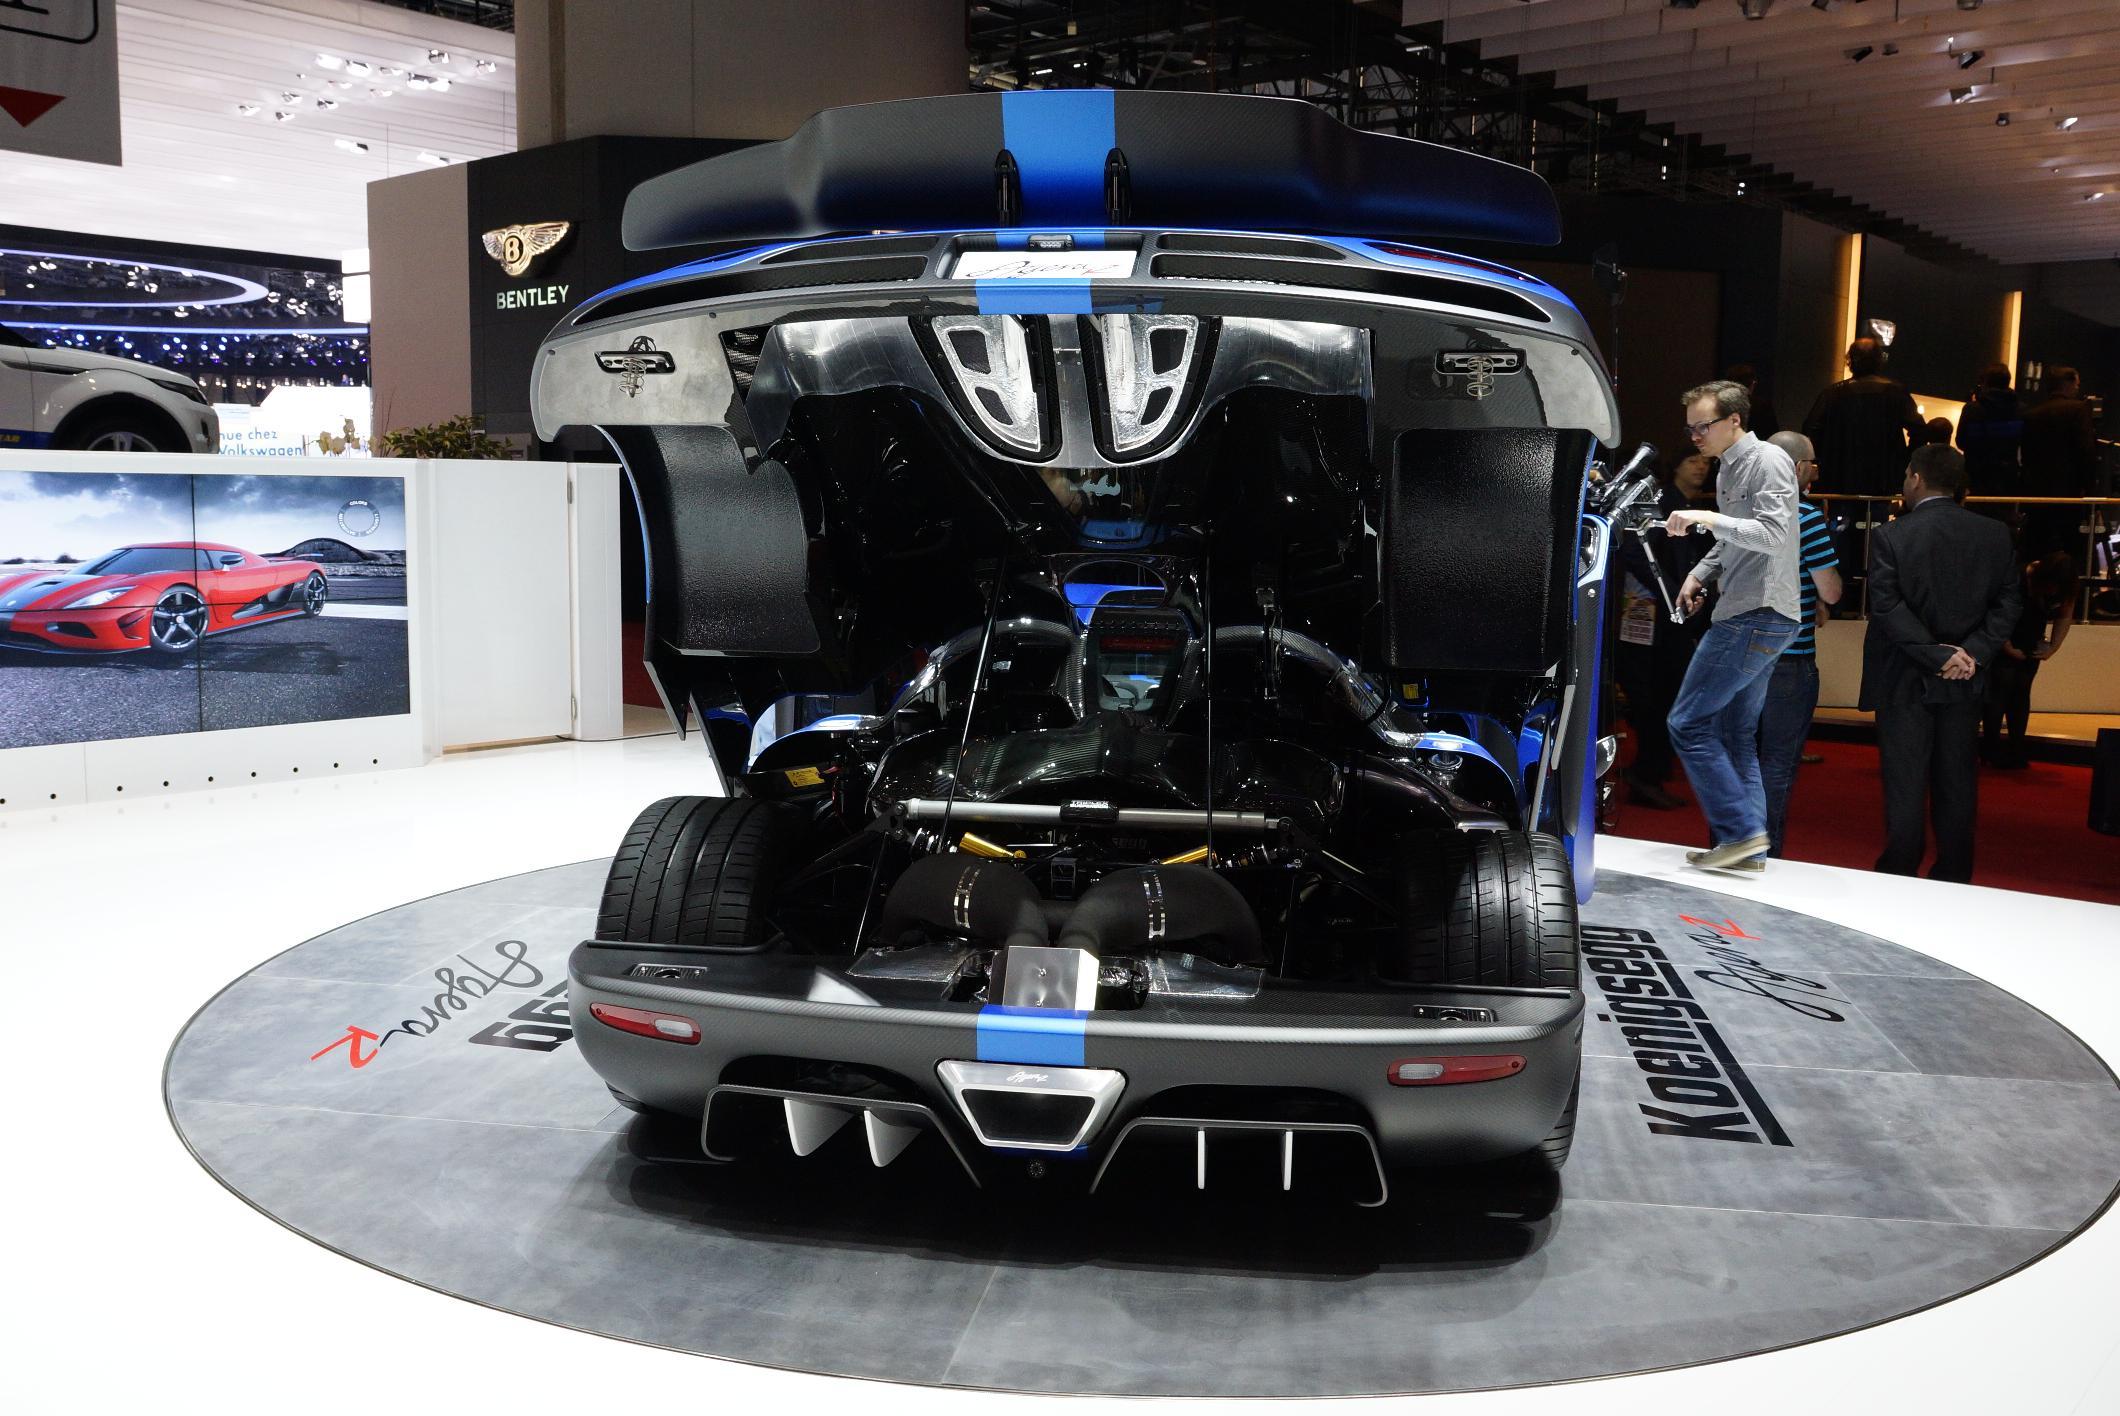 Koenigsegg Agera R Geneva 2012 Engine